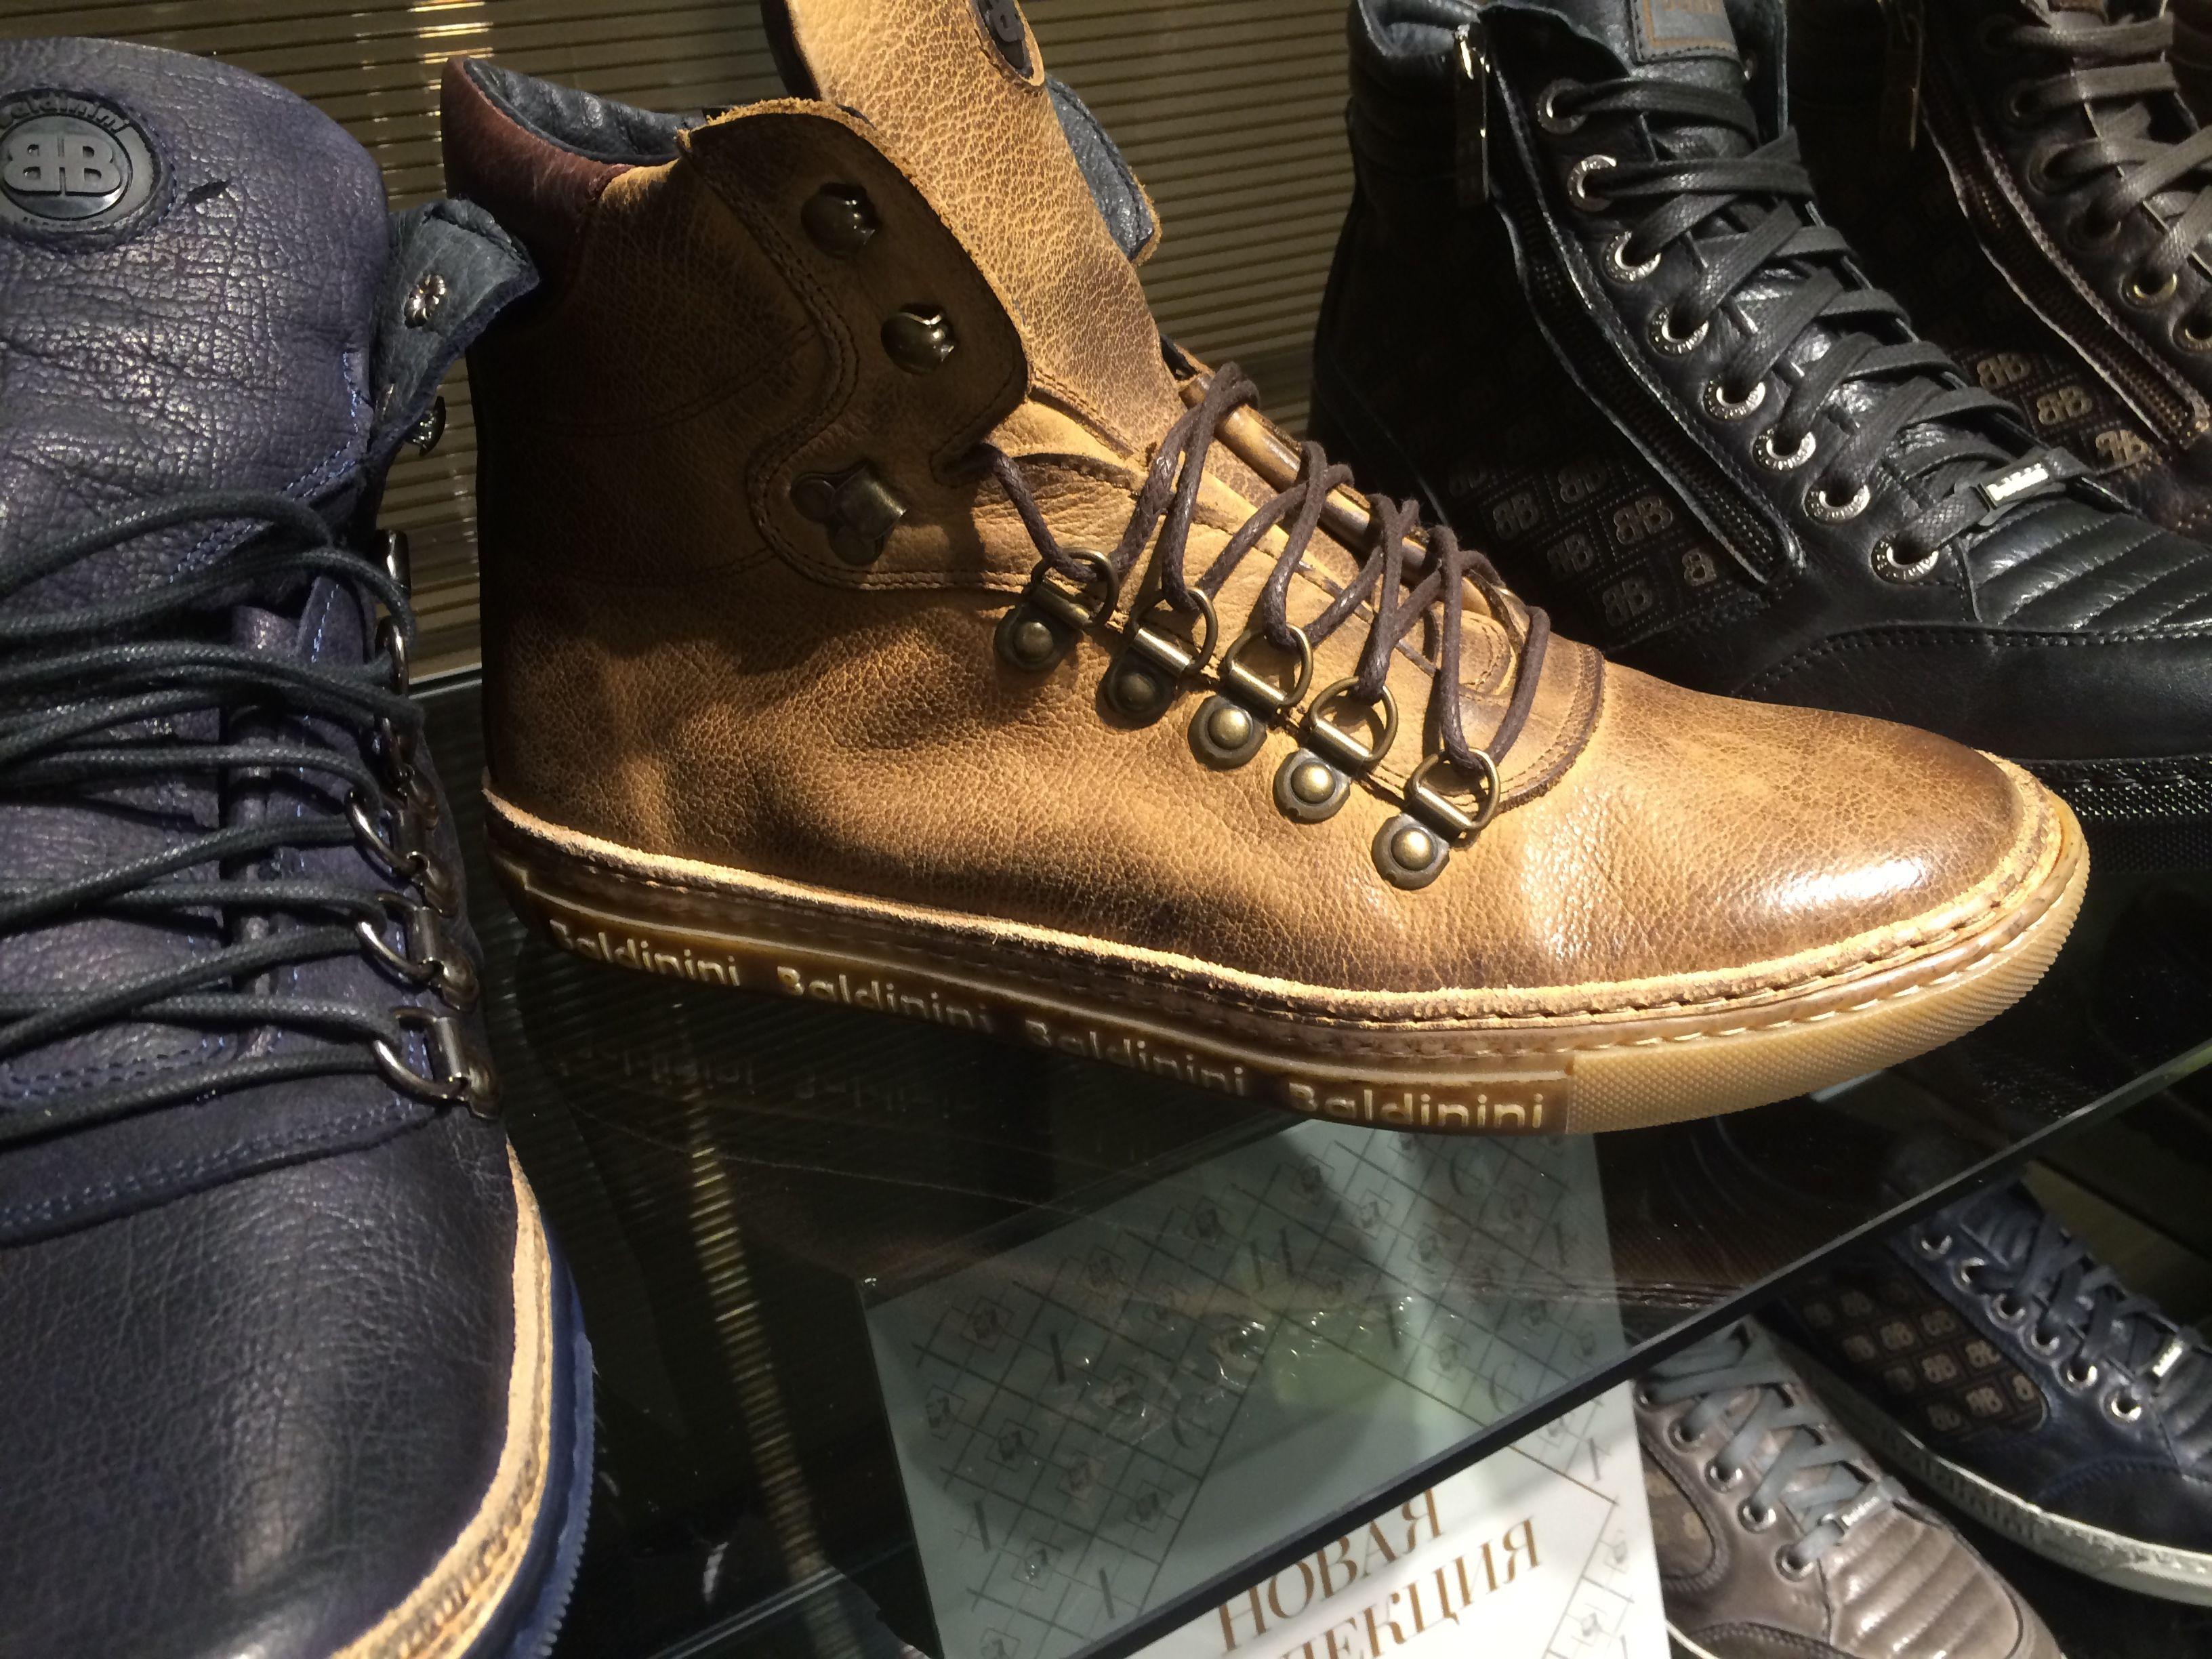 Baldinini Men Shoes Brown Seen in the Baldinini Outlet shop